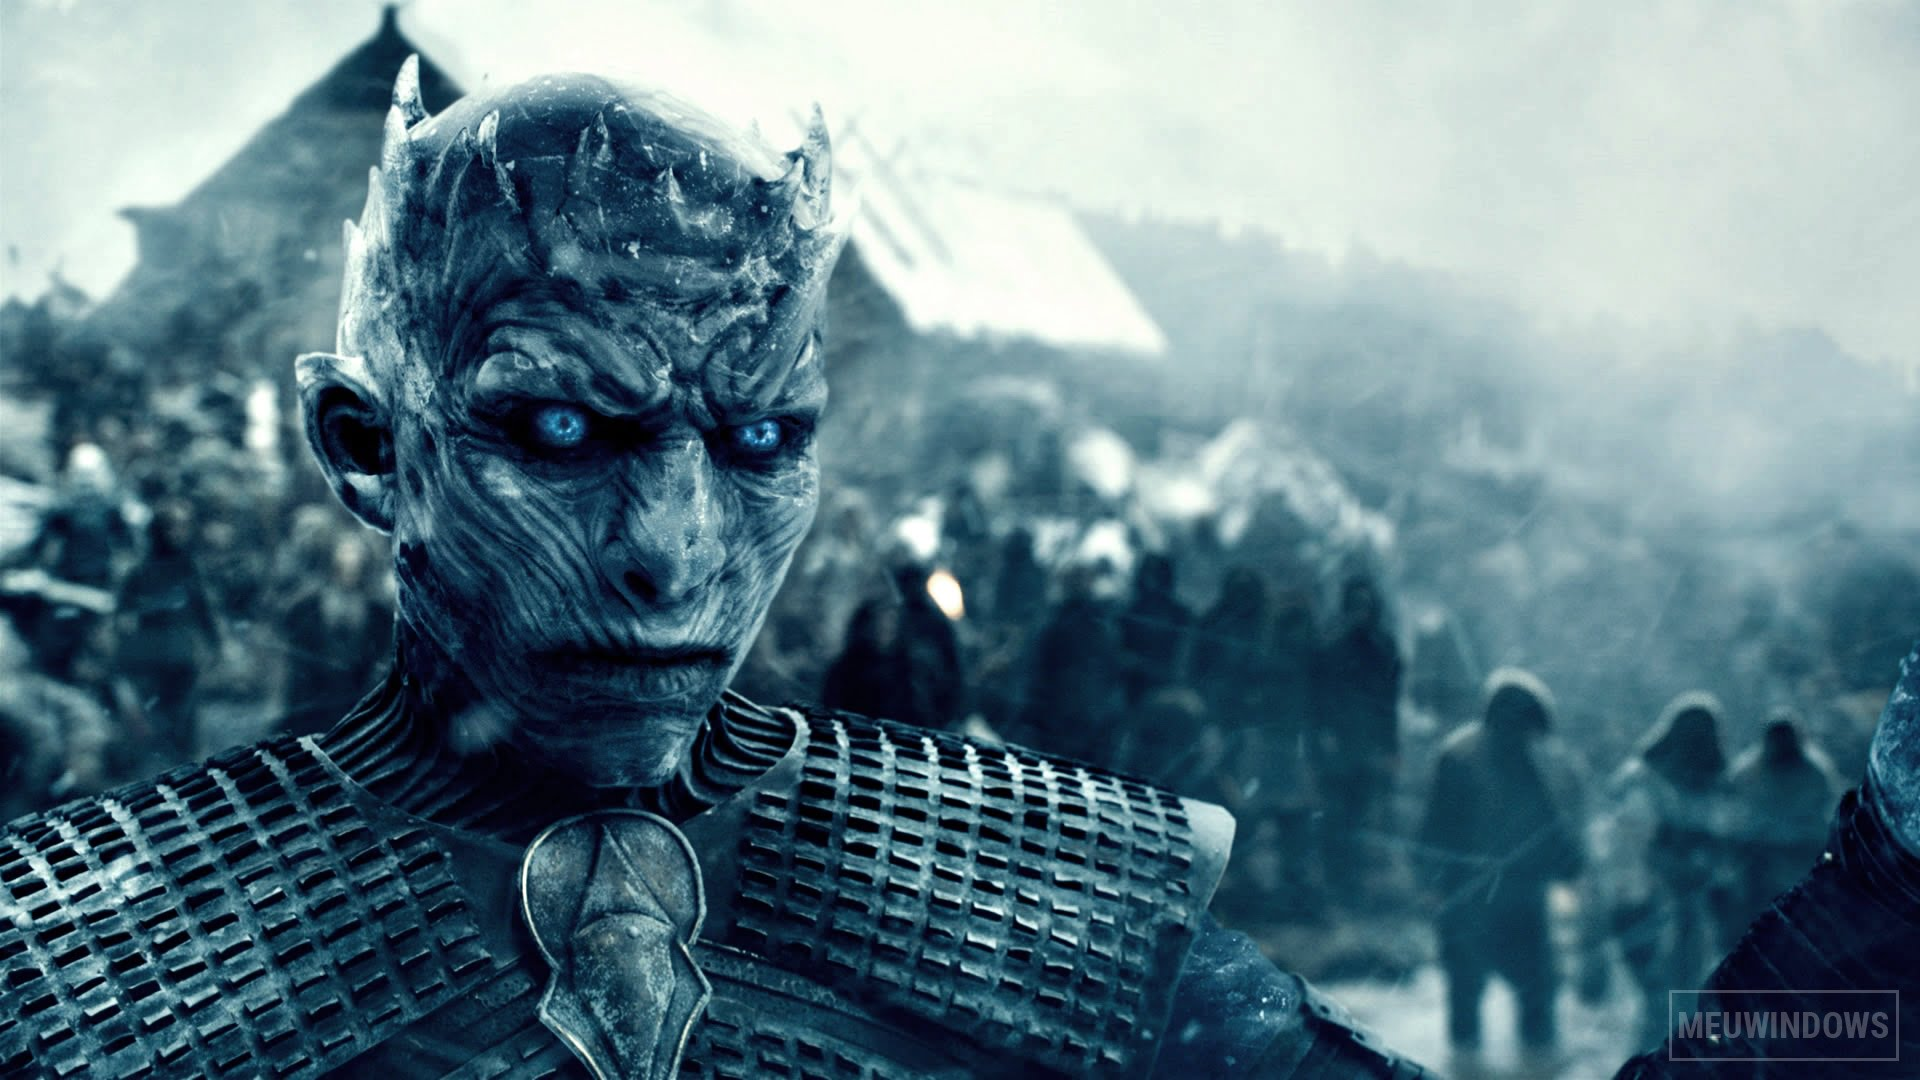 Game Of Thrones Wallpapers Hd 1800p Download Meu Windows